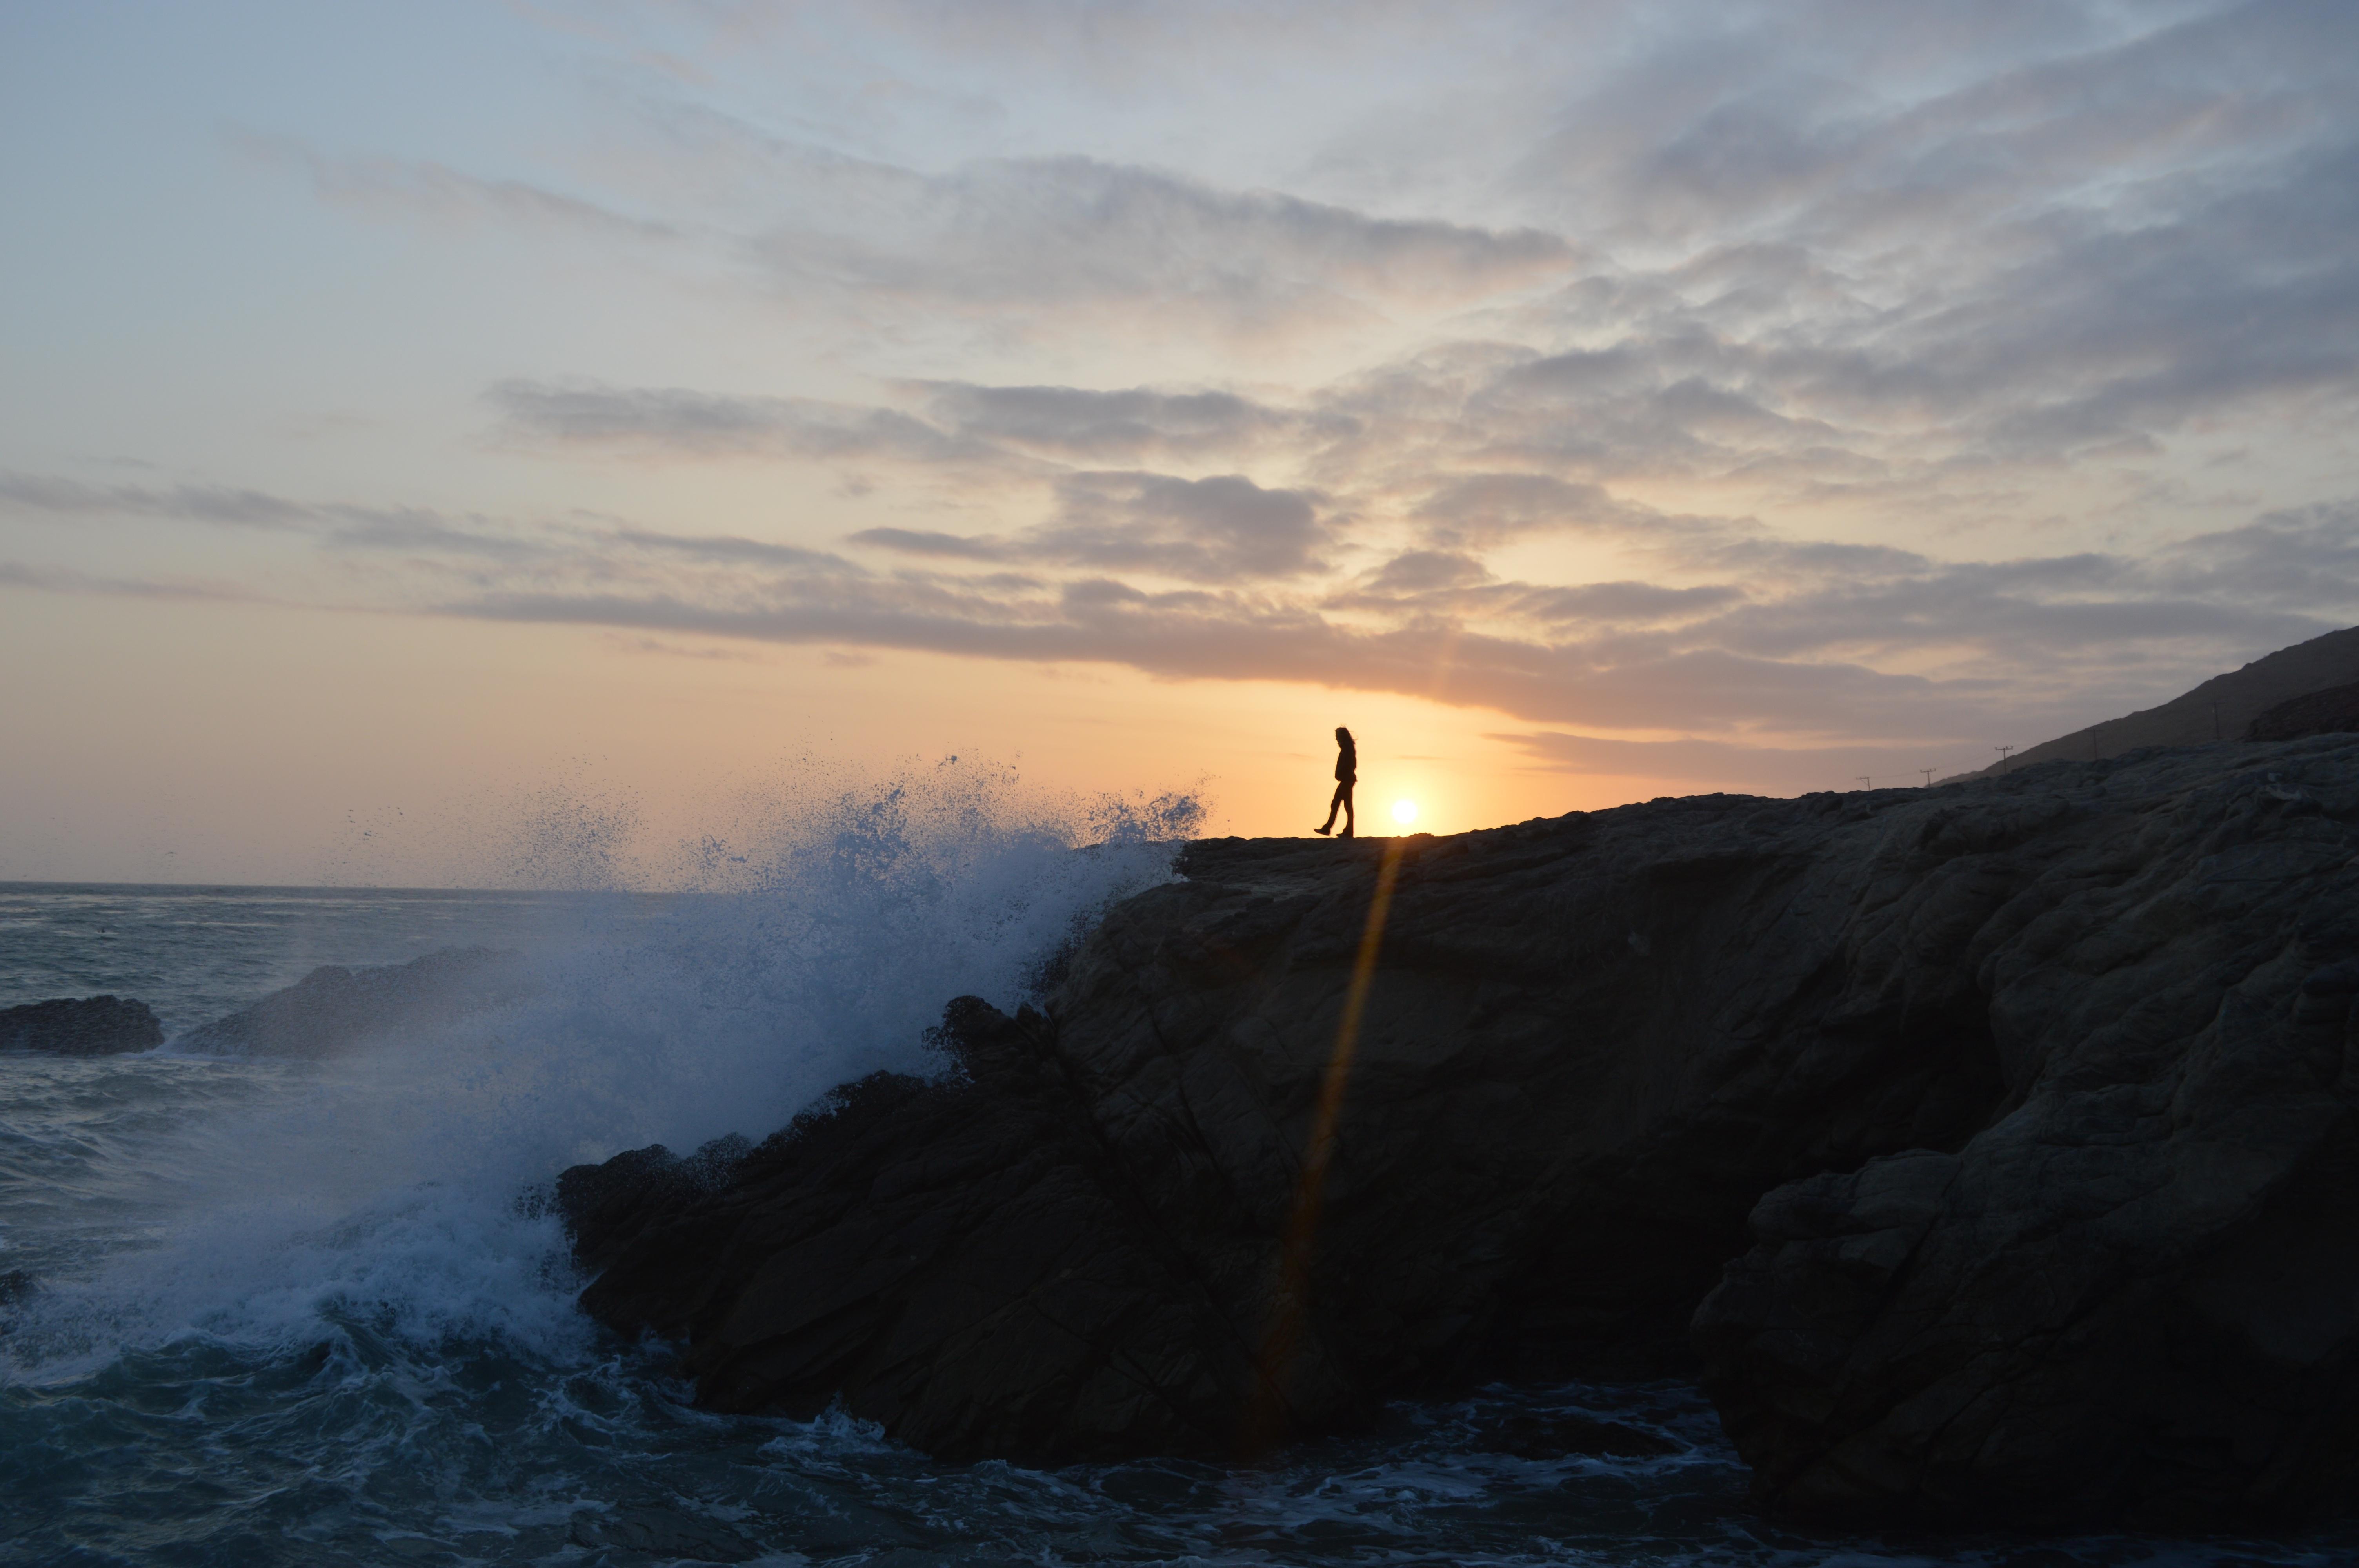 Cliff waves sunset_cam adams_stocksnap